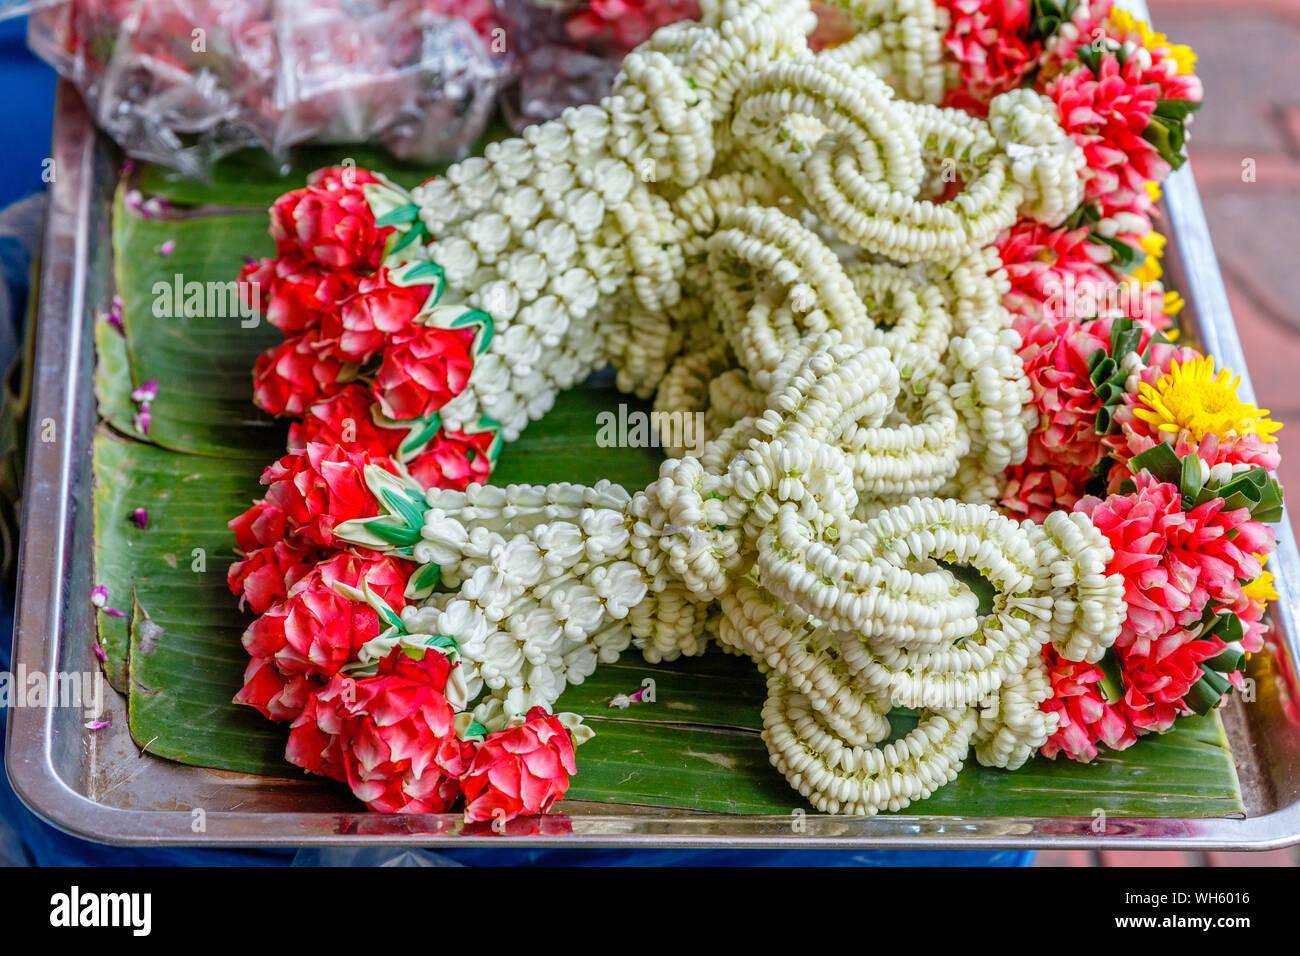 Various jasmine Phuang malai, traditional Thai flower garland offerings at Pak Khlong Talat, Bangkok flower market. Thailand. Stock Photo